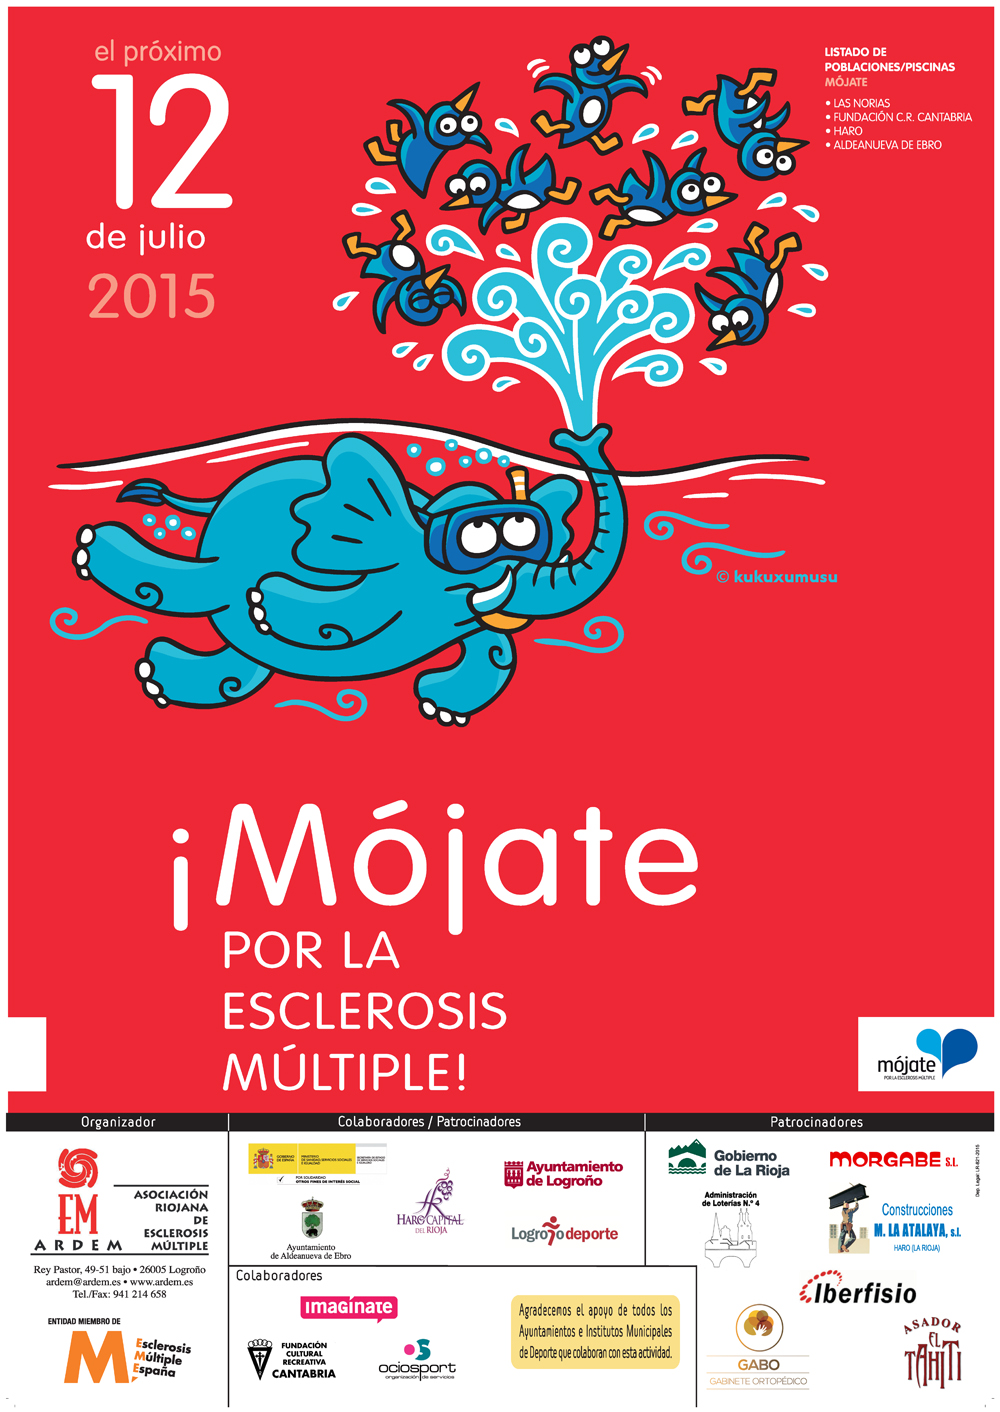 12 de Julio, Mójate por la Esclerosis Múltiple